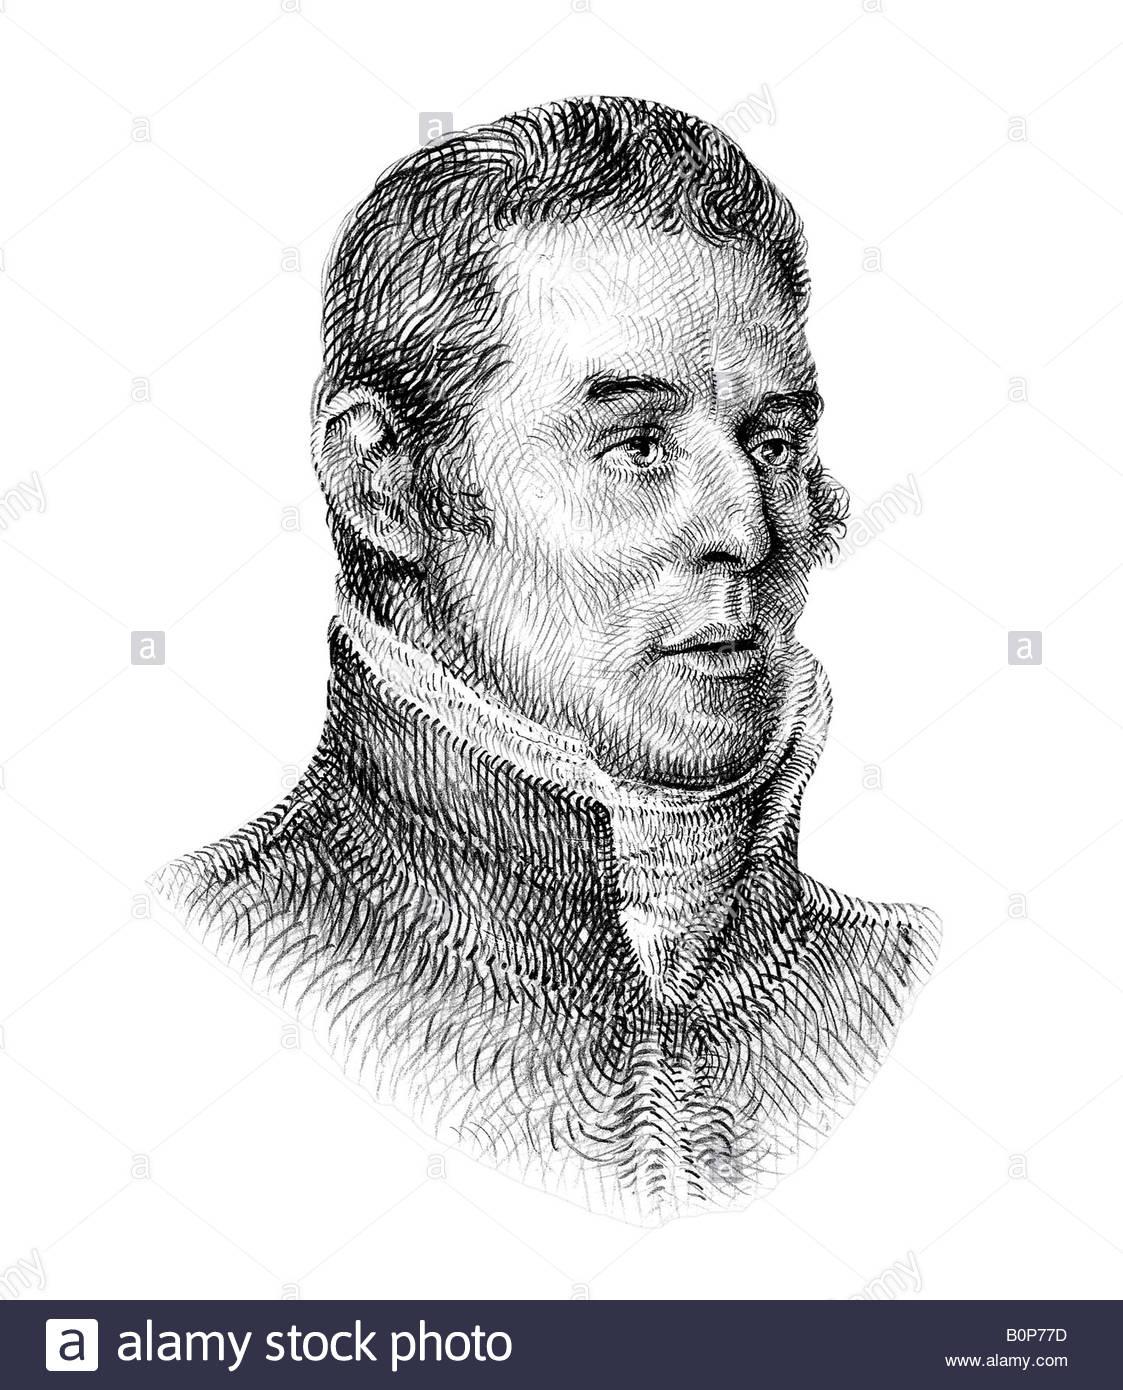 Duke of Wellington 1769 1852 Irish born Soldier Statesman Cross Hatch Style Modern Illustration - Stock Image